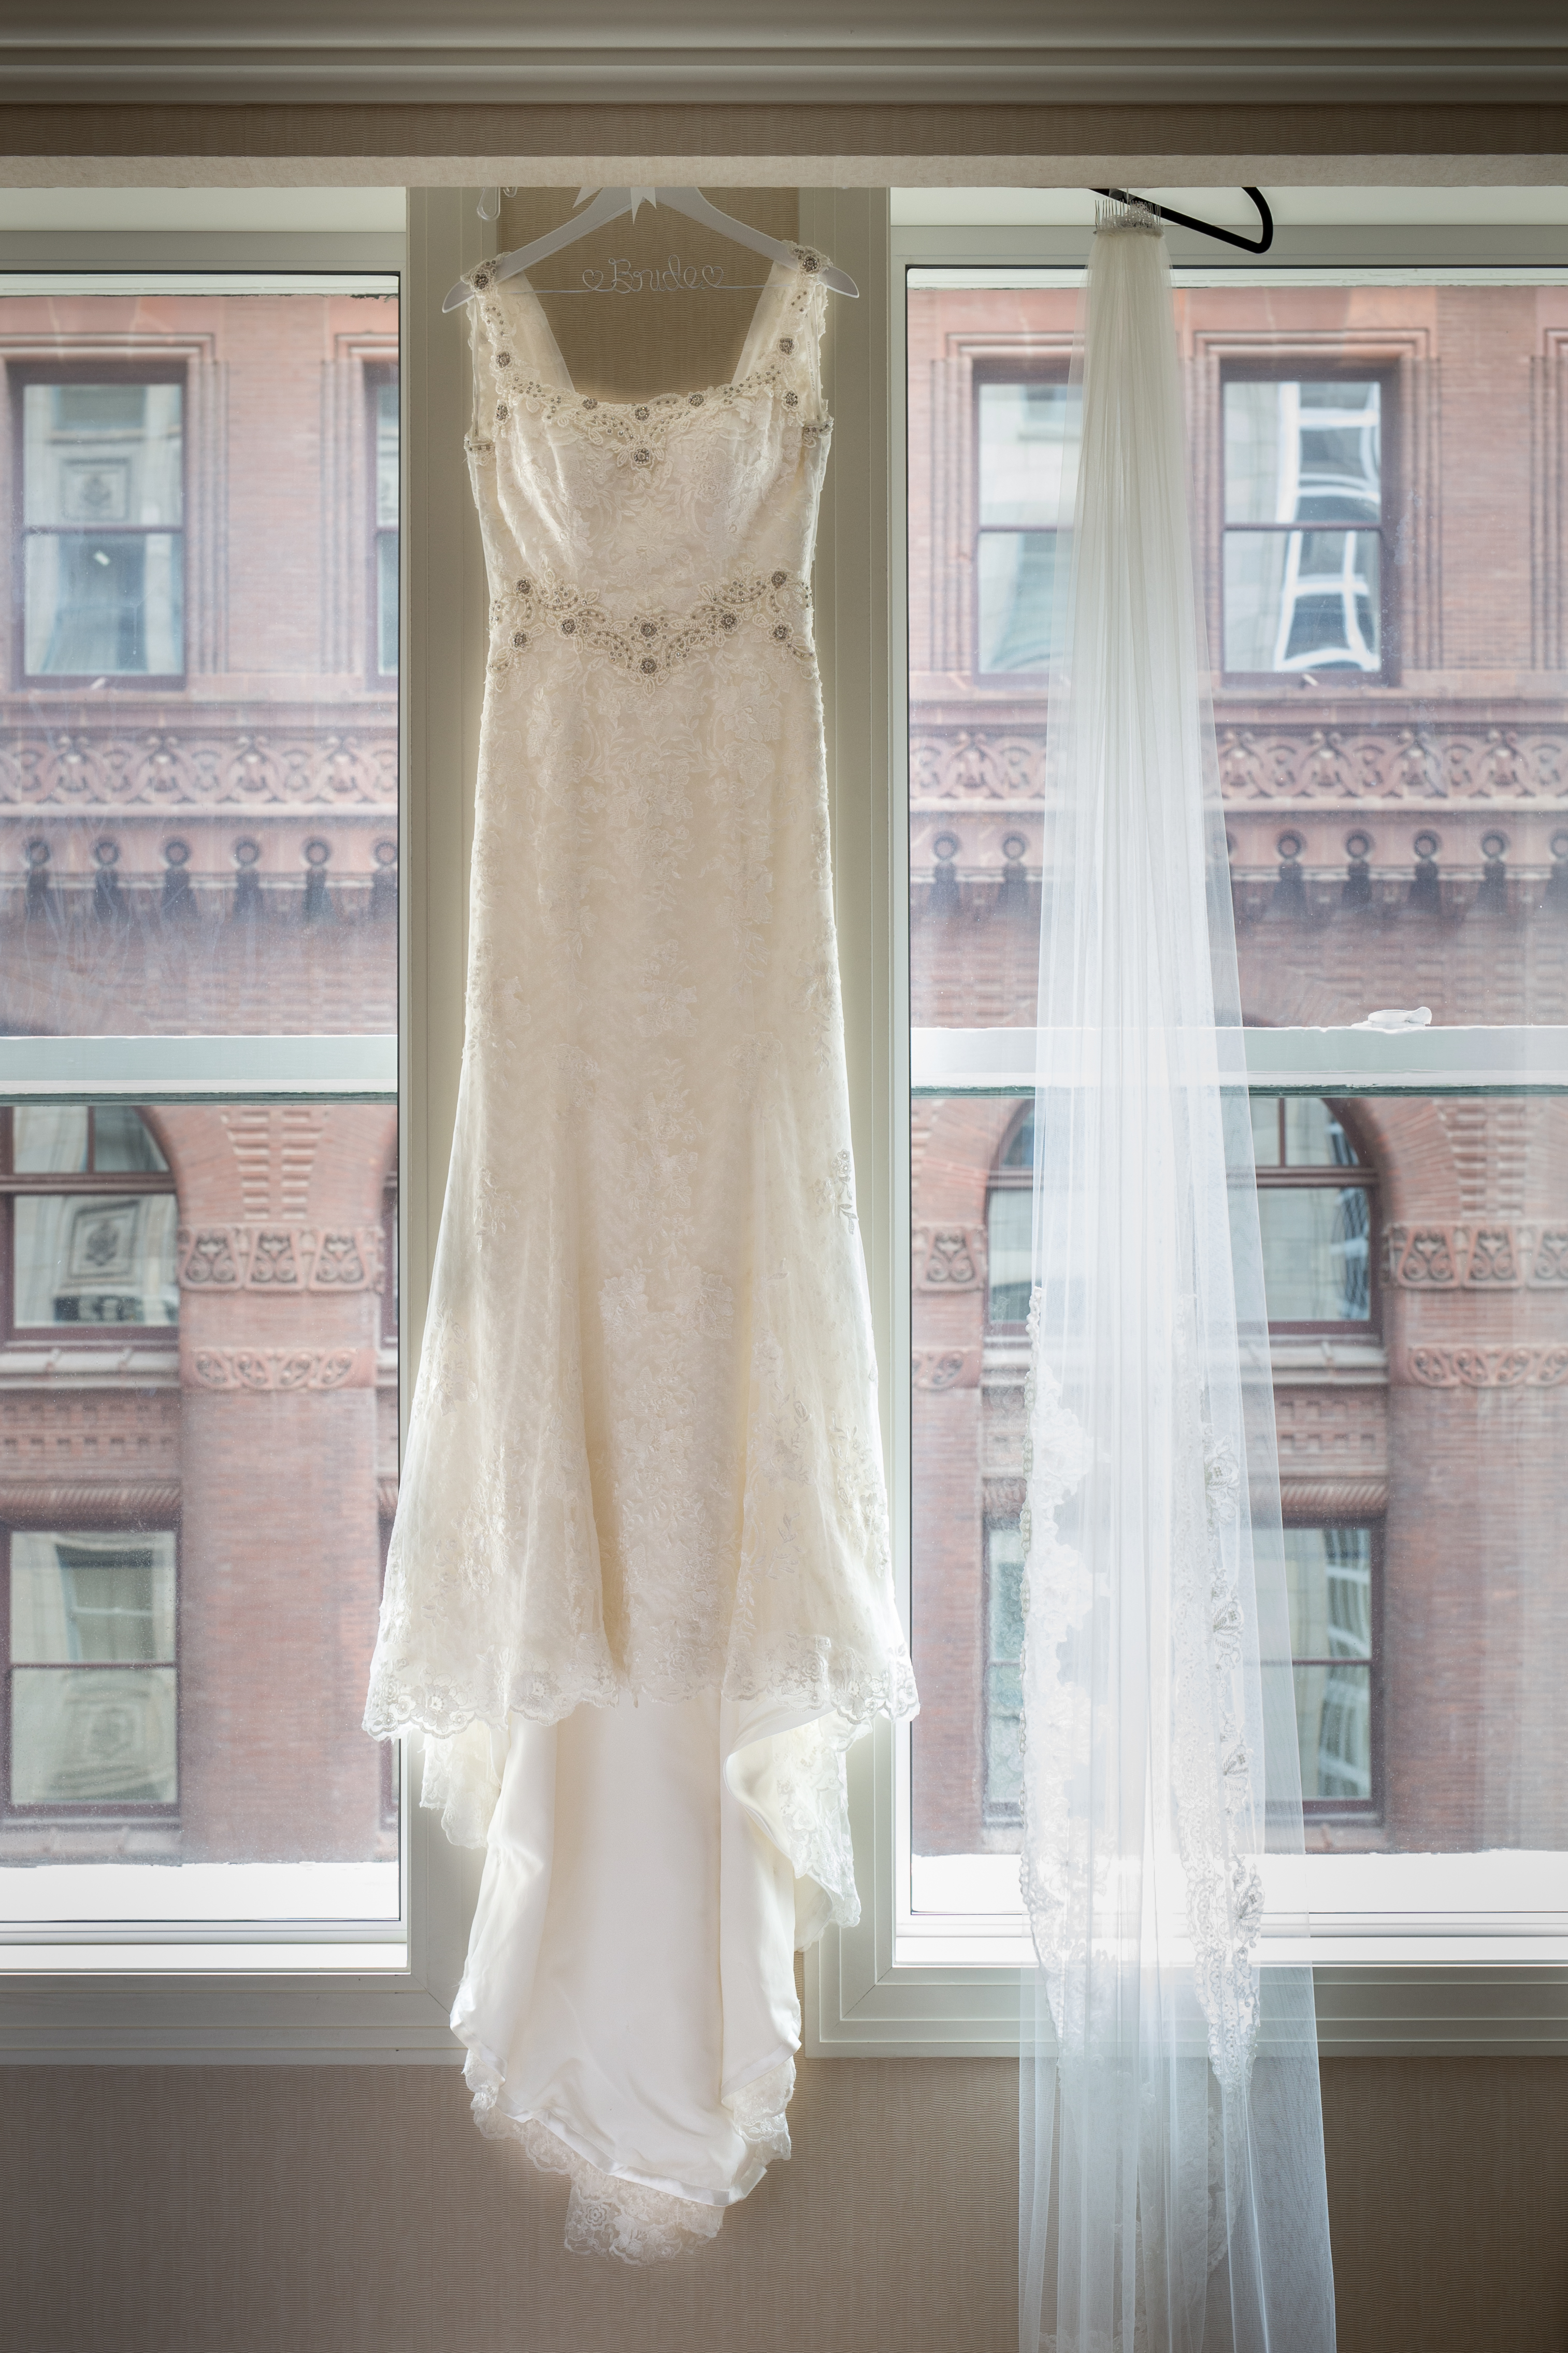 Chicago Ballroom Wedding - Andre LaCour Photography